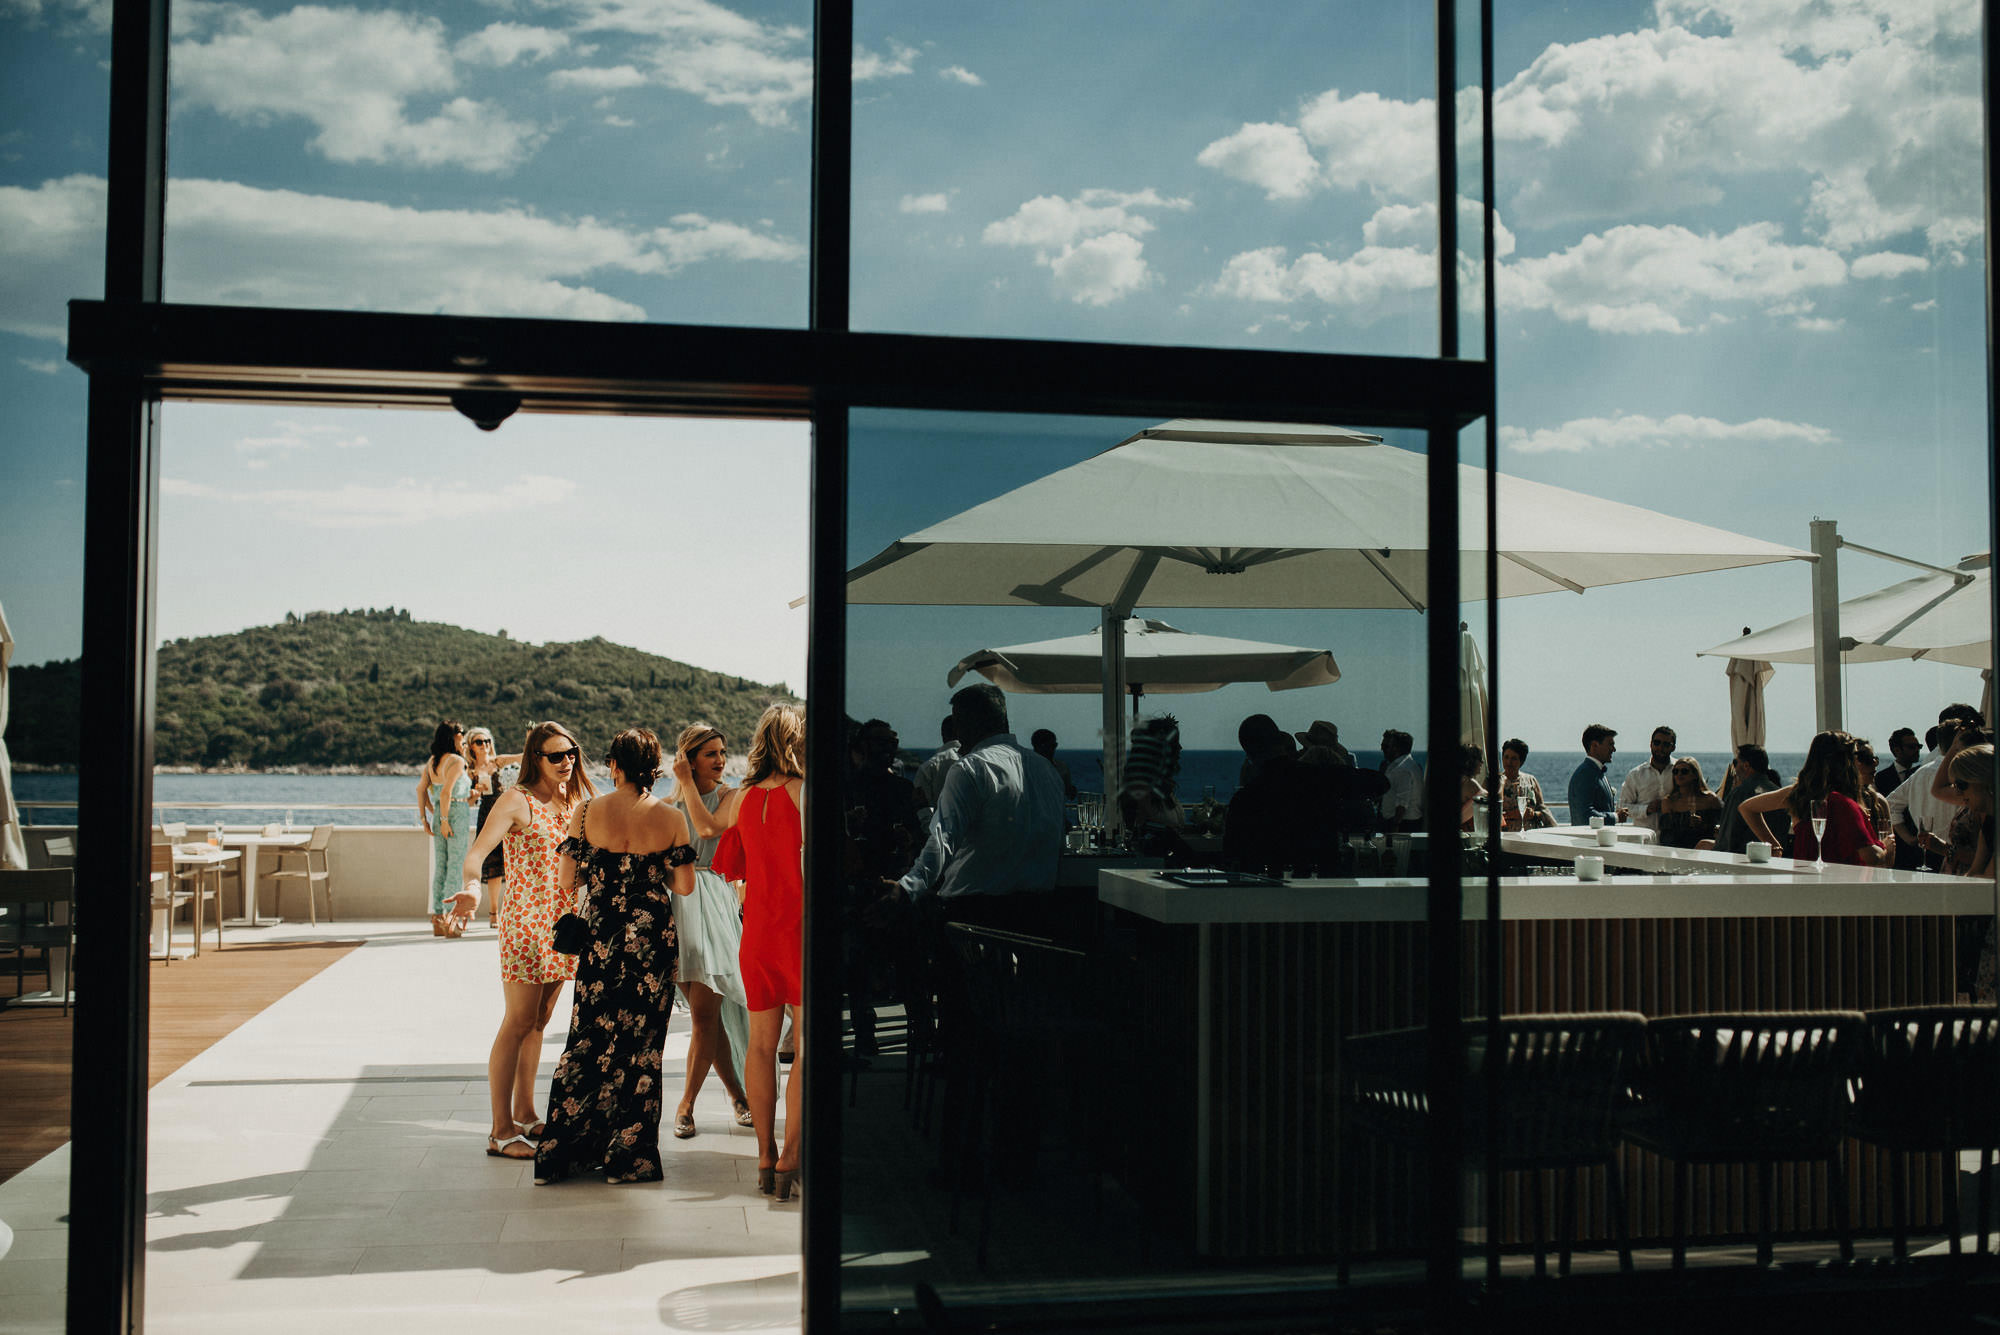 dubrovnik_croatia_wedding_photographer-jere_satamo-destination_weddings-047-web.jpg